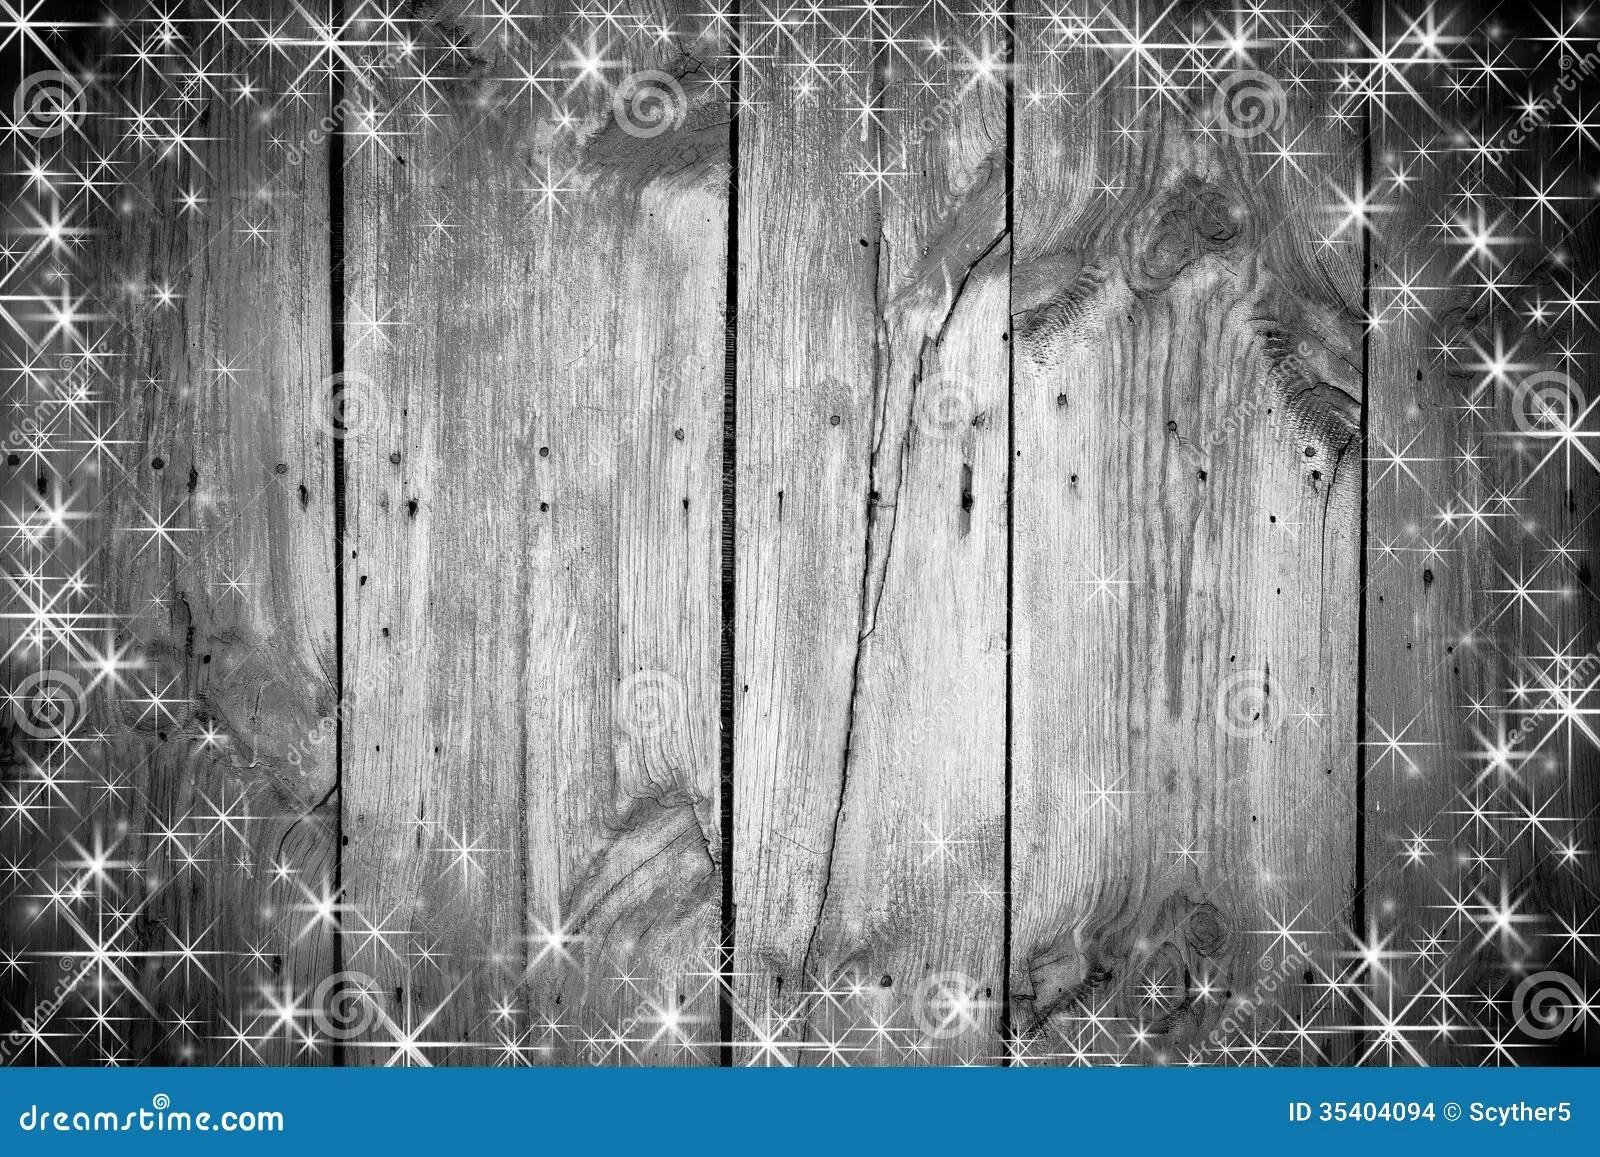 Christmas Background Stock Images Image 35404094